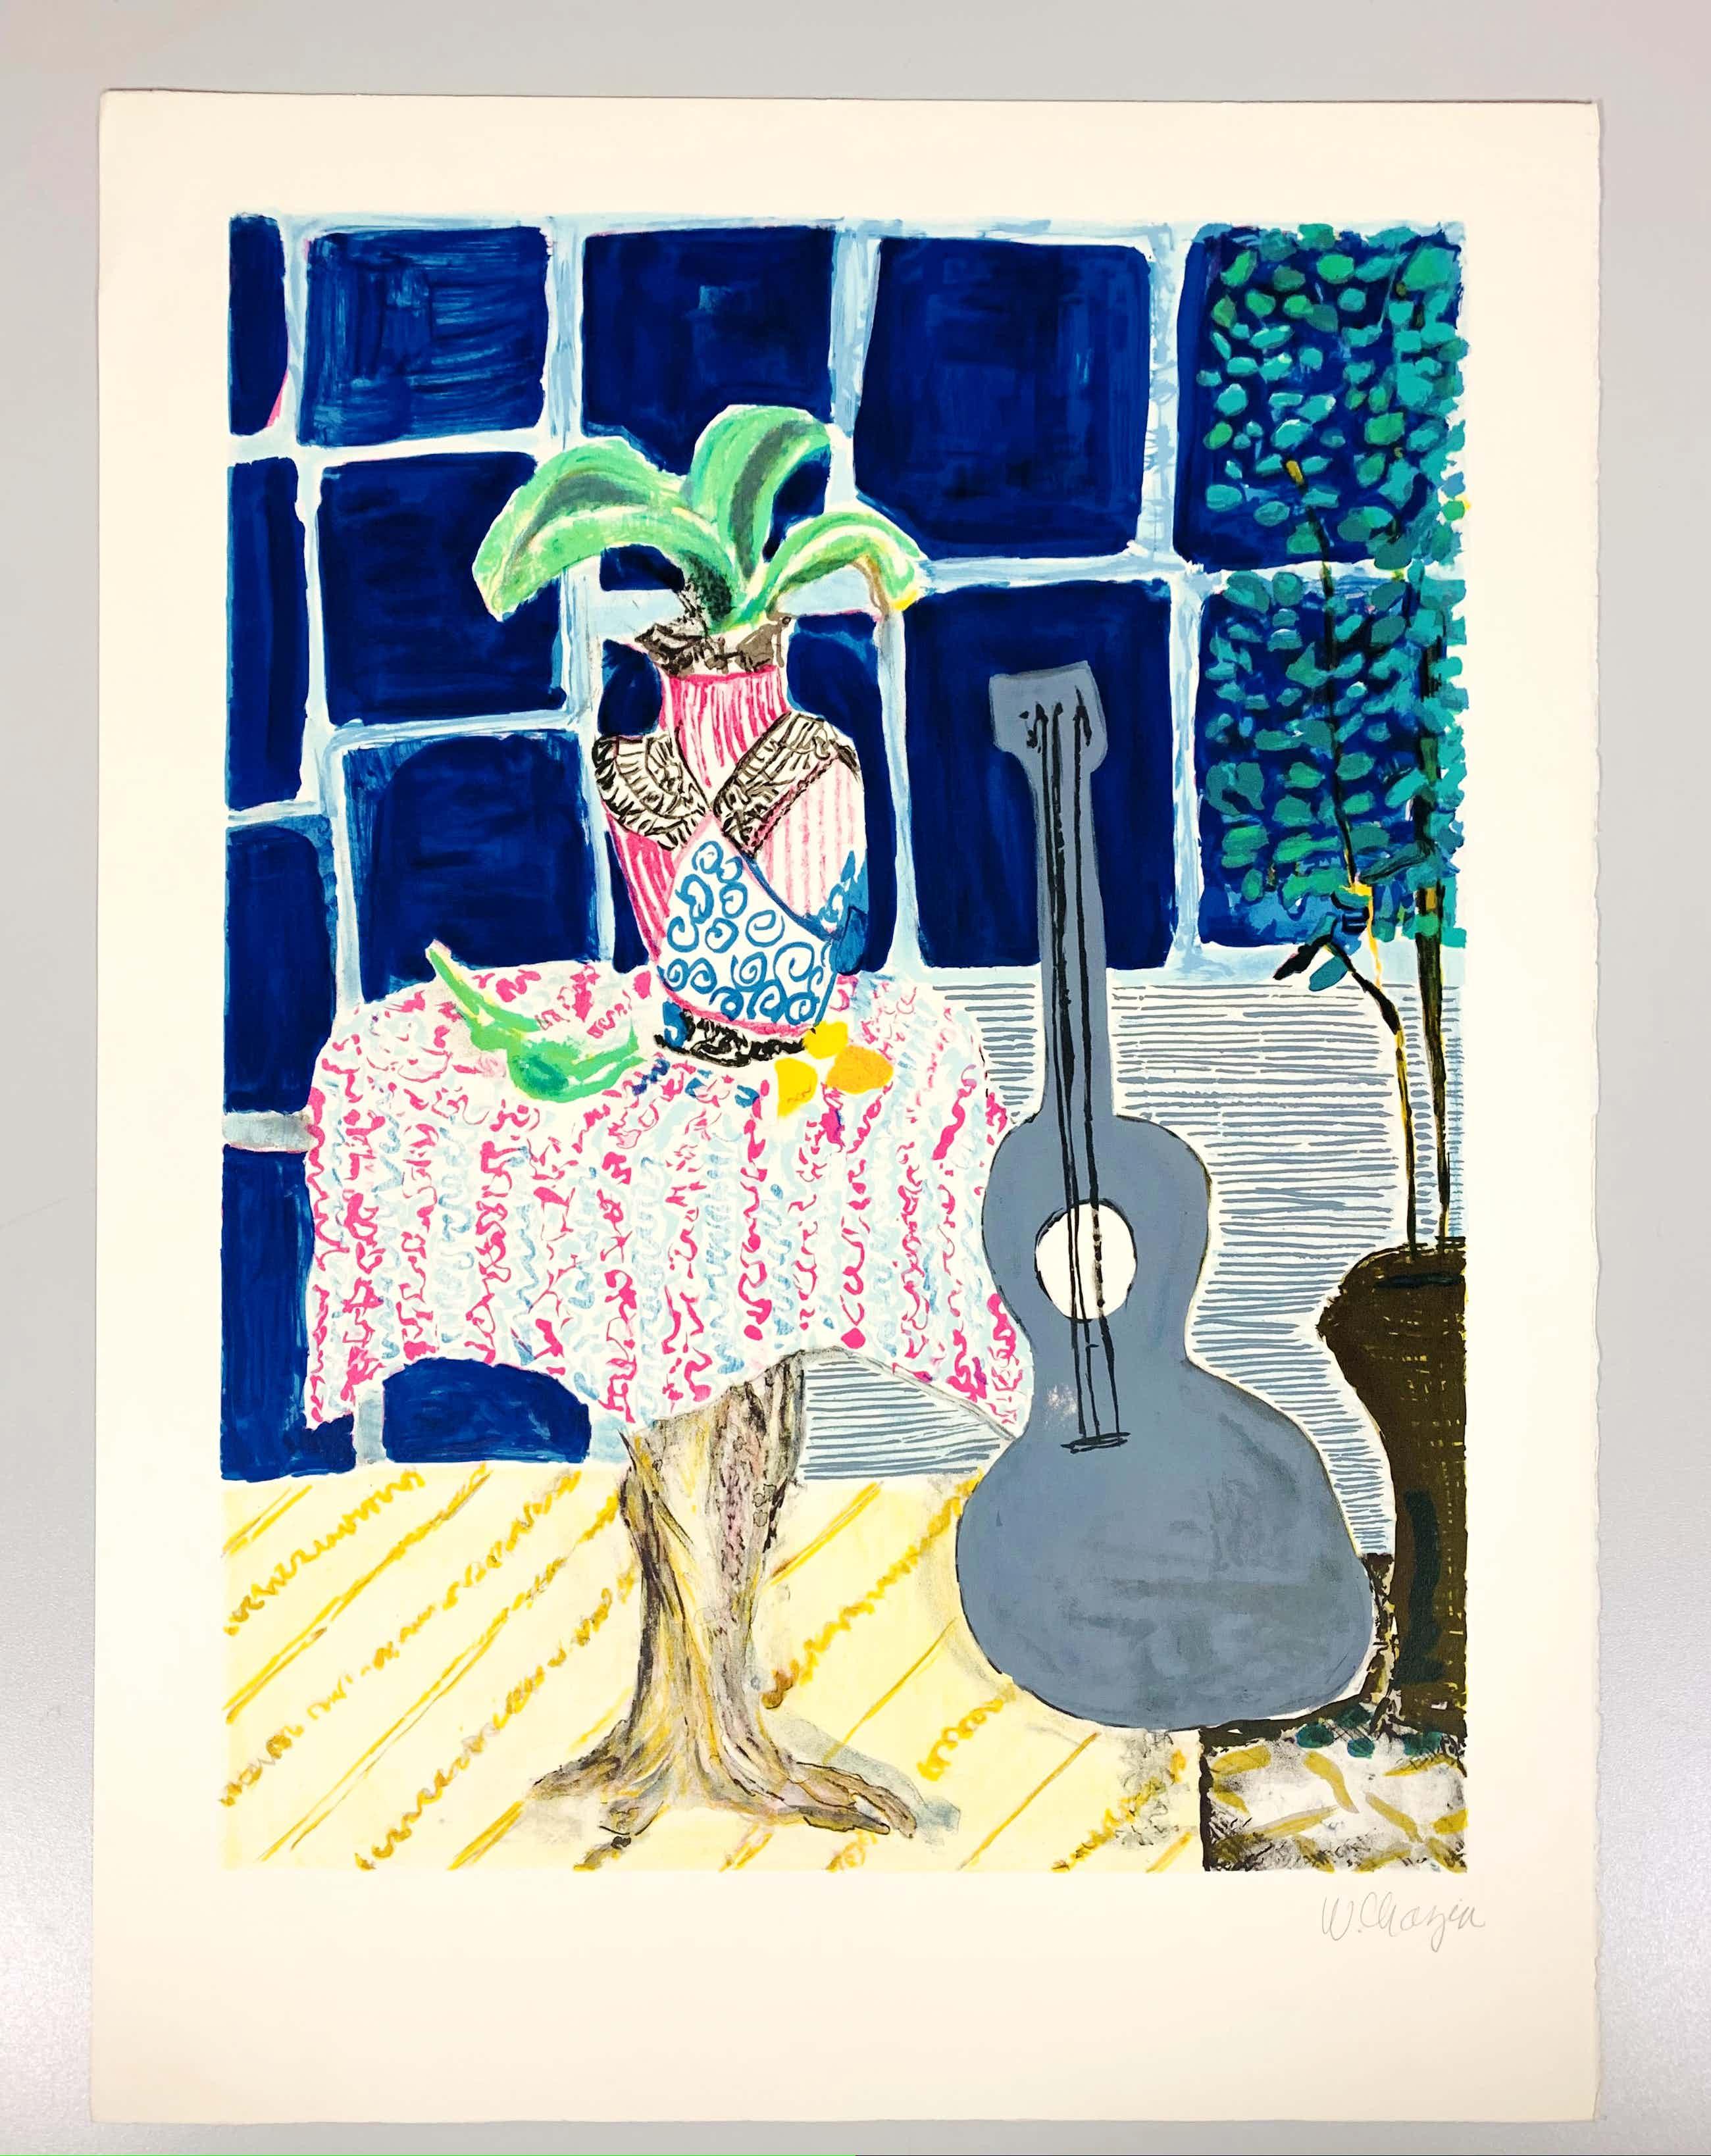 Wendy Chazin - Composition with Guitar and Vase kopen? Bied vanaf 30!